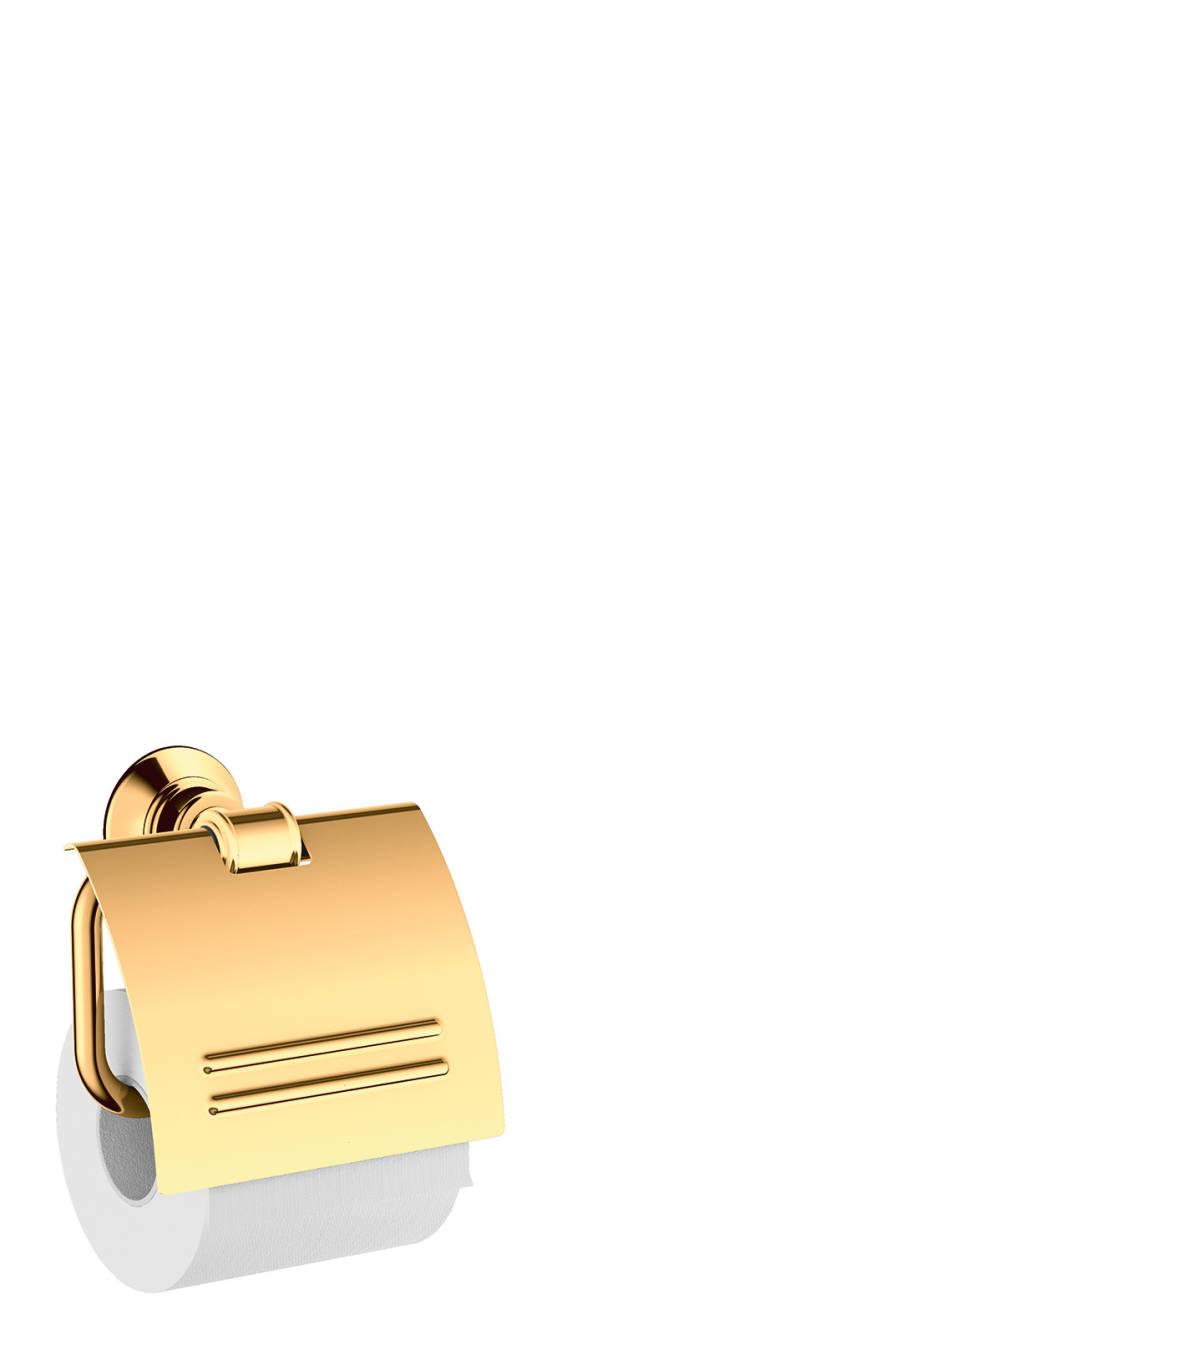 Roll holder, Polished Gold Optic, 42036990